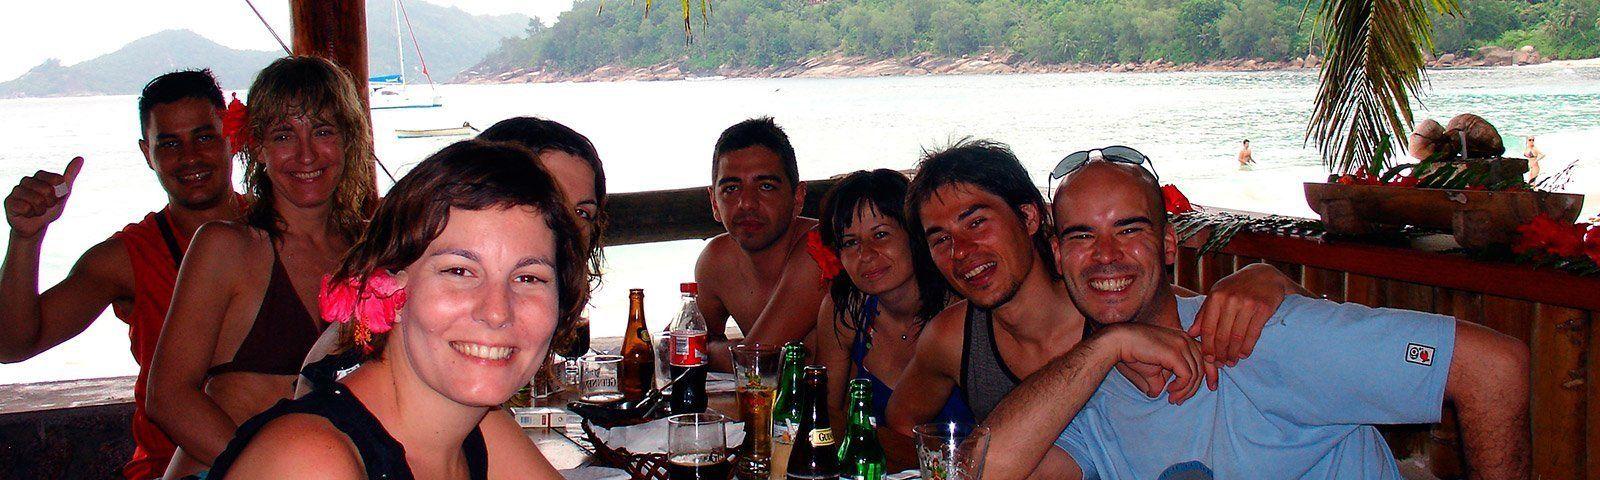 travesia-barco-tailandia-catamaran-(19)